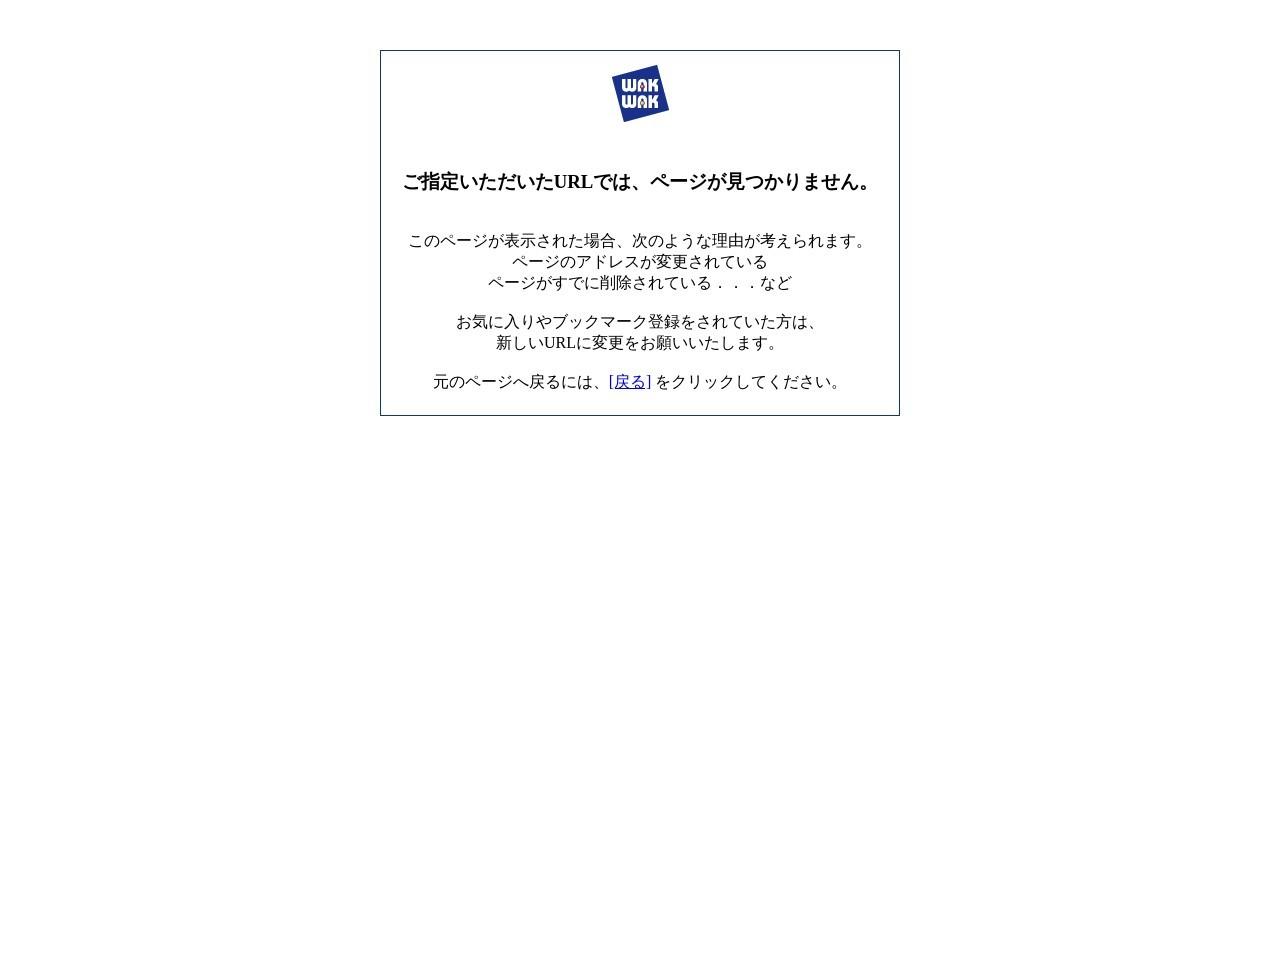 http://park3.wakwak.com/~meisui-plaza/